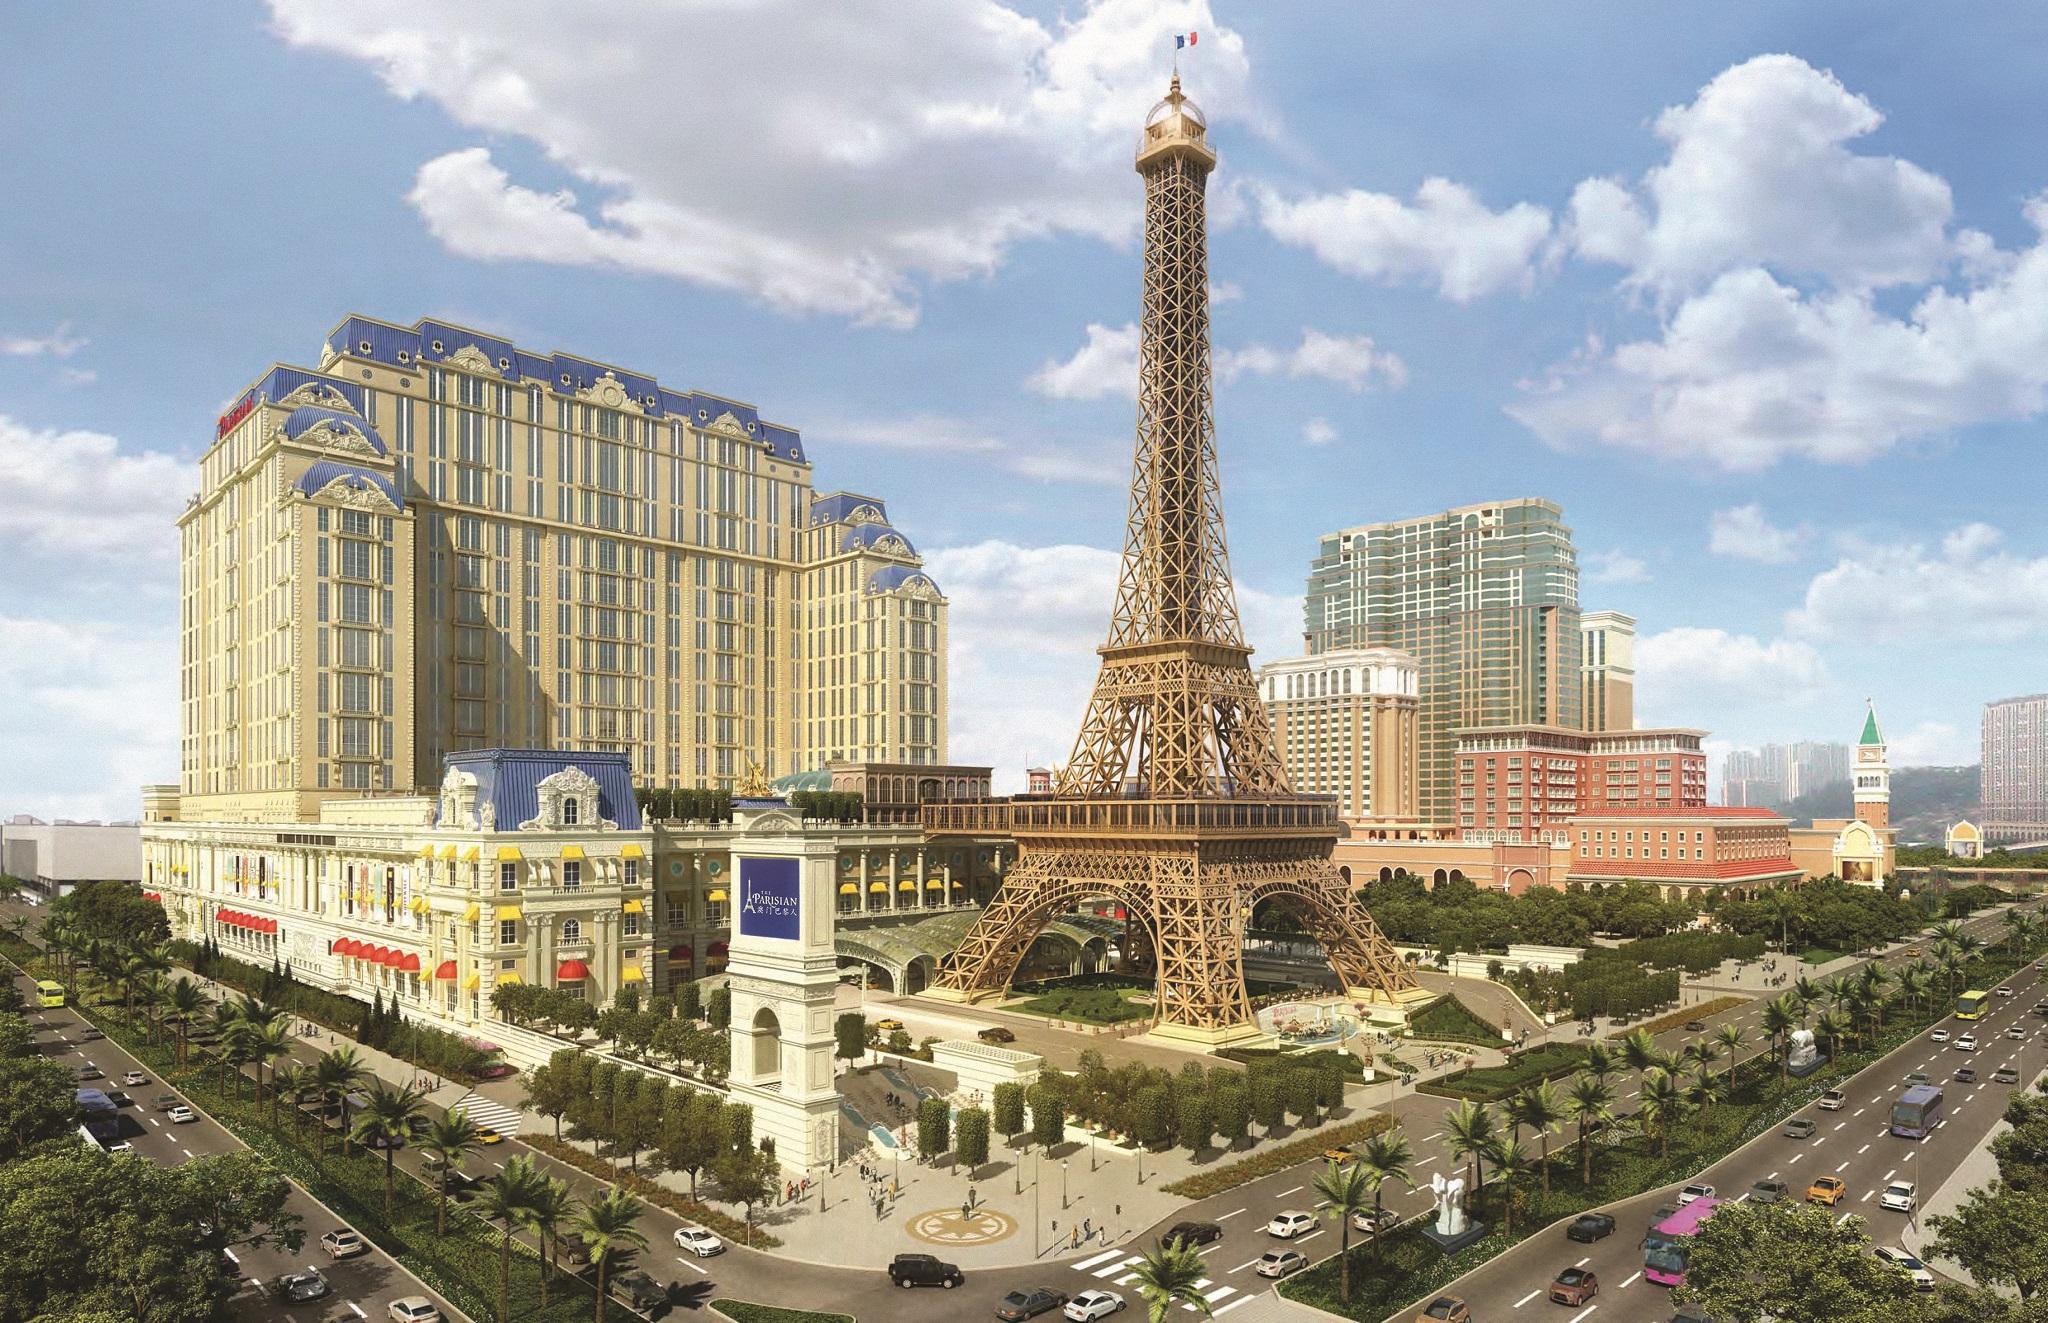 The Parisian Macao,Cotai